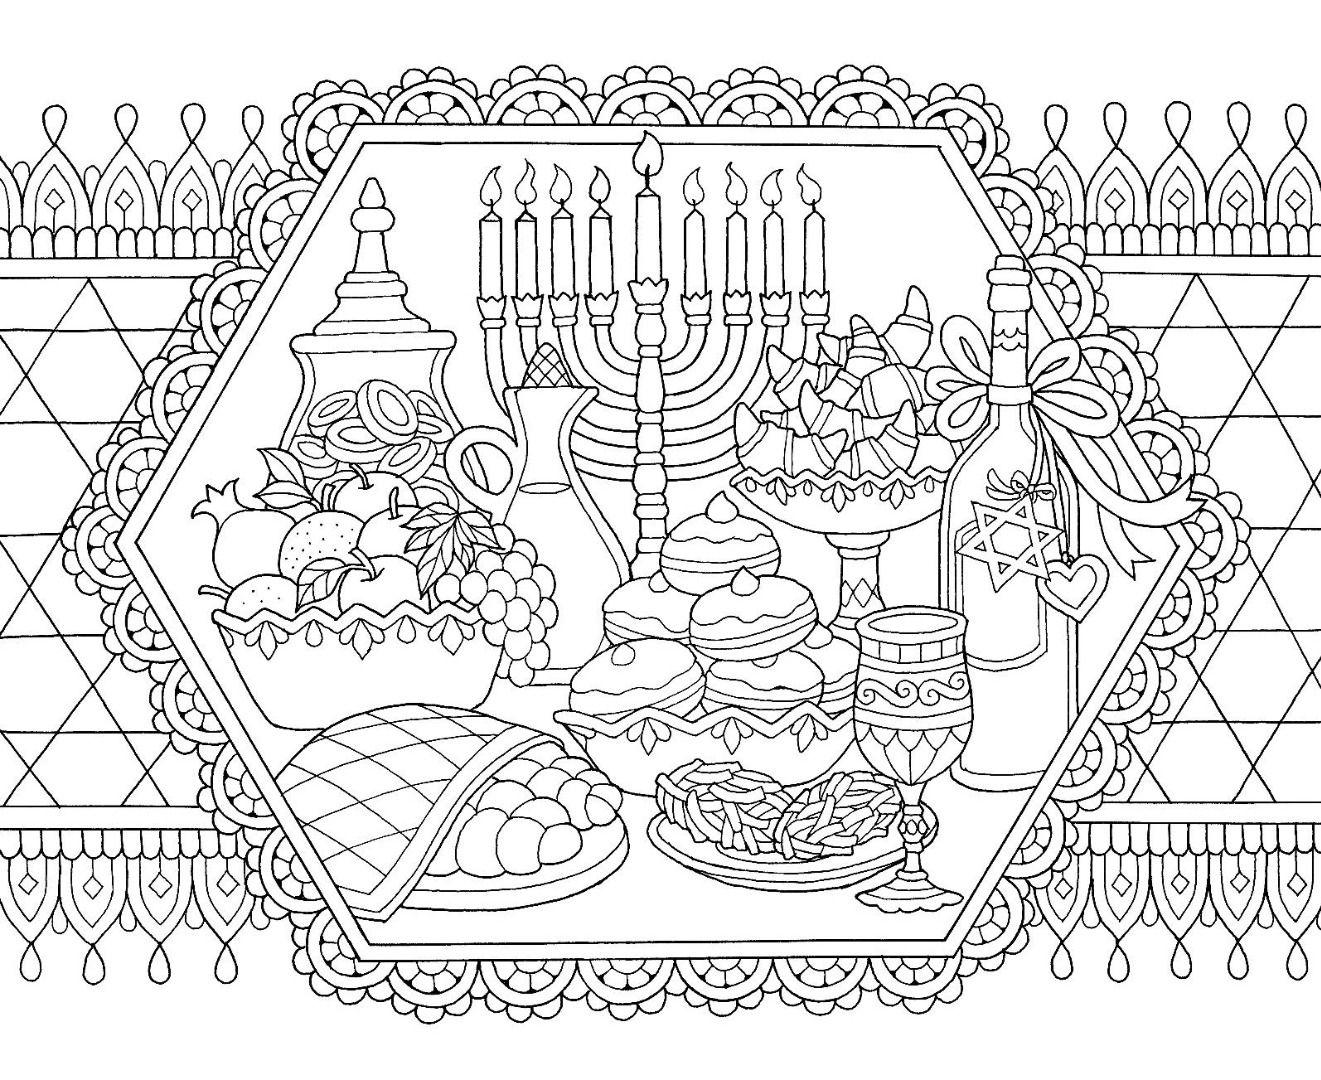 Hanukkah Feast Coloring Page Coloring Pages Hanukkah Crafts Hanukkah